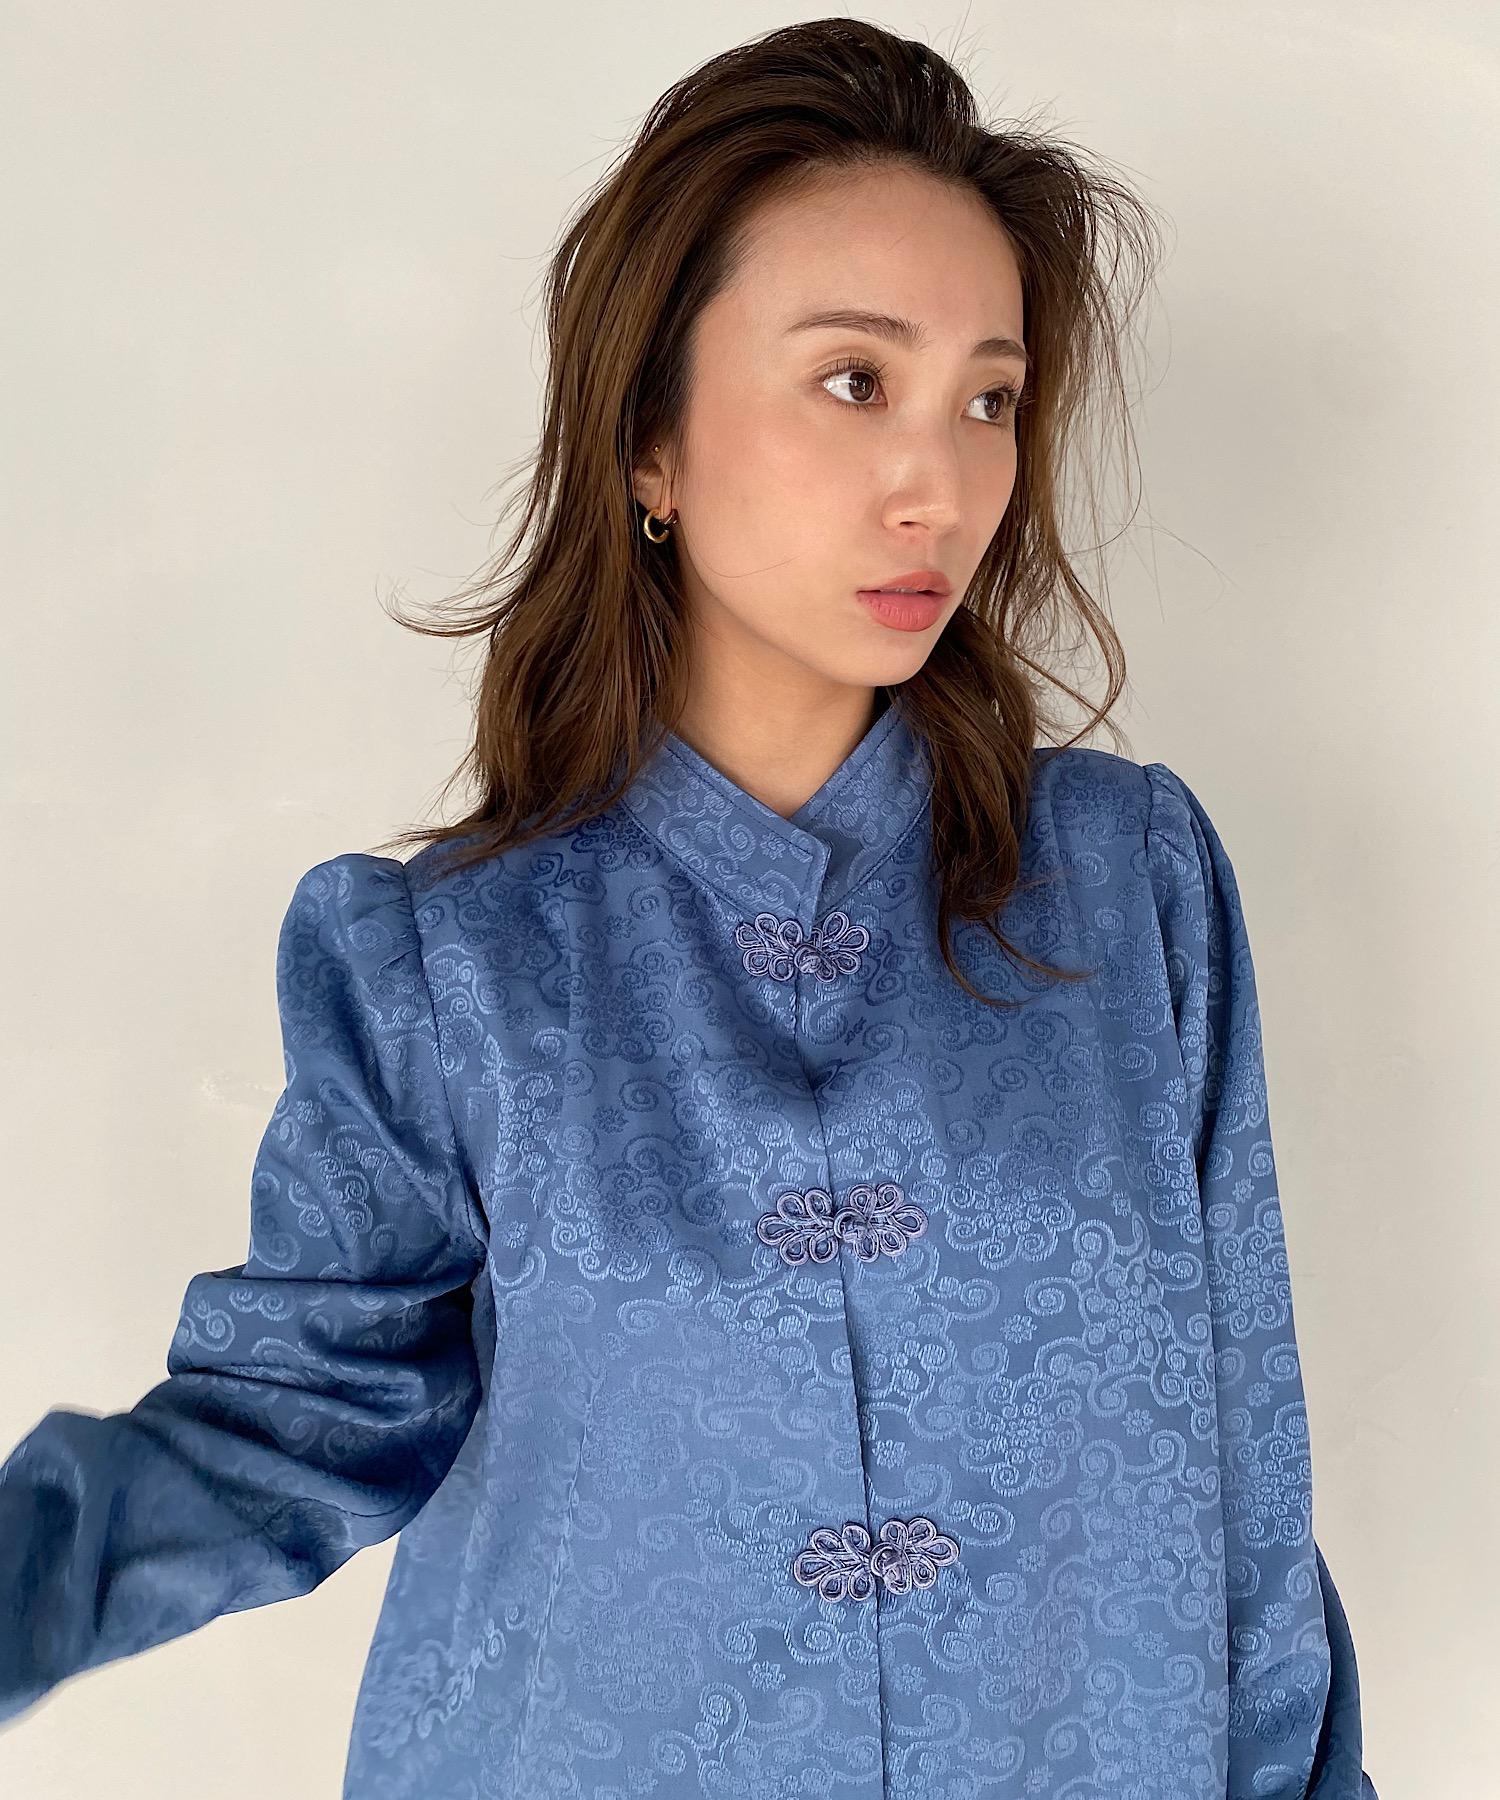 【SANSeLF】Se middle neck china shirt sanwt1